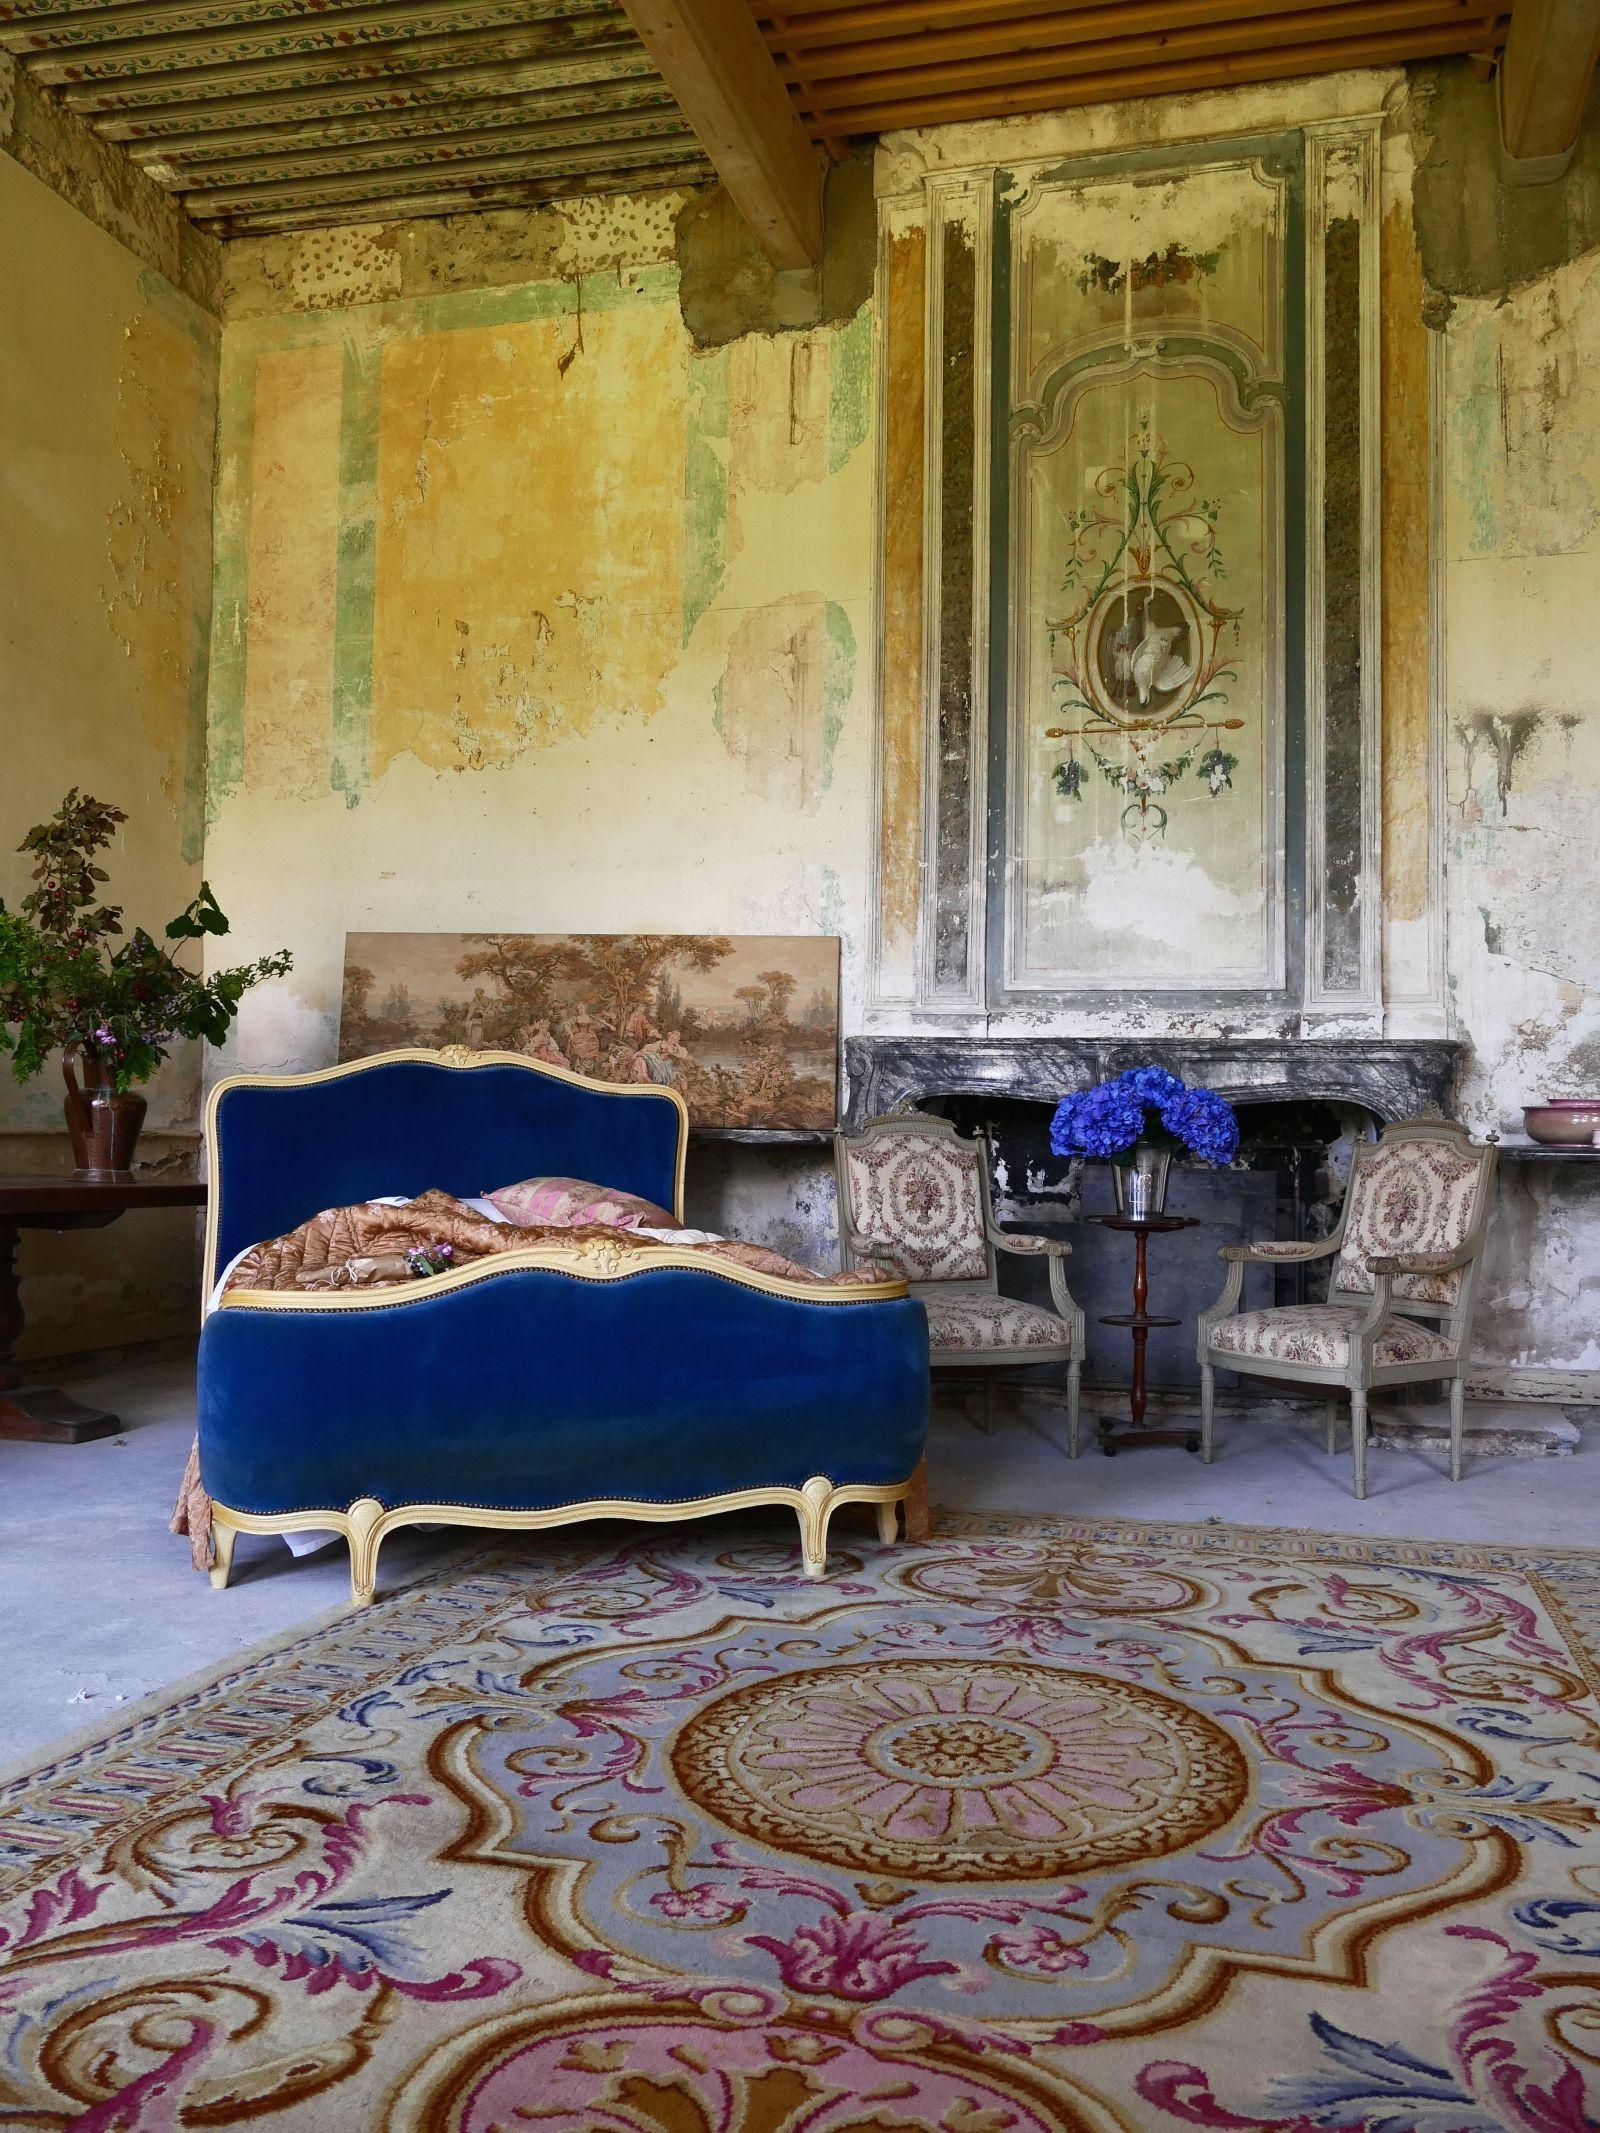 Step Inside A Once-Abandoned French Château